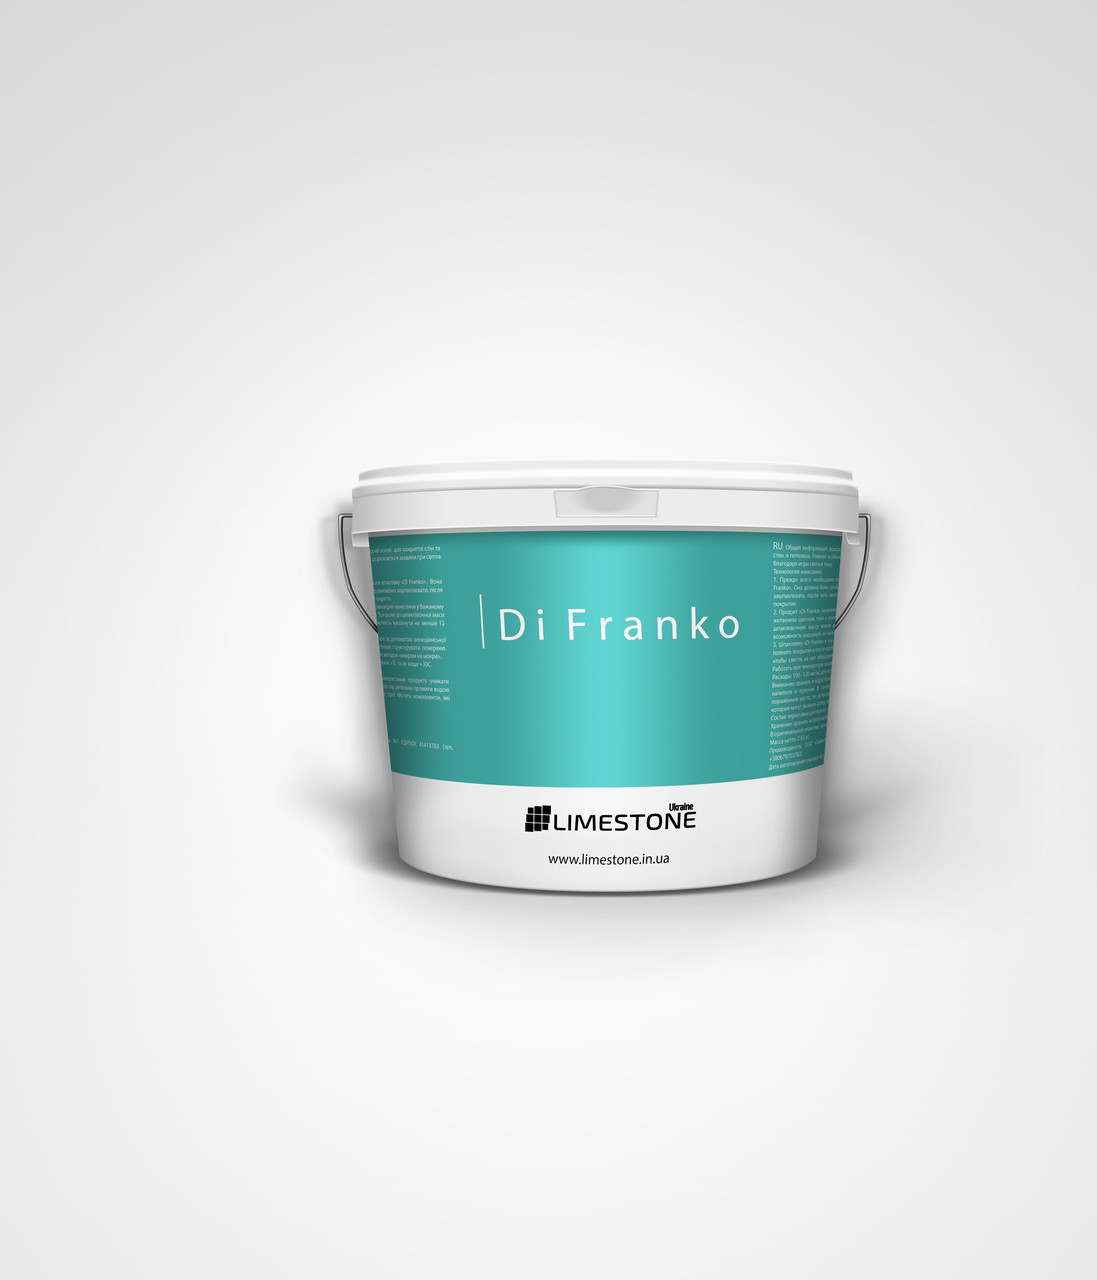 Декоративная шпаклевка LimeStone Di Franko 2.5л